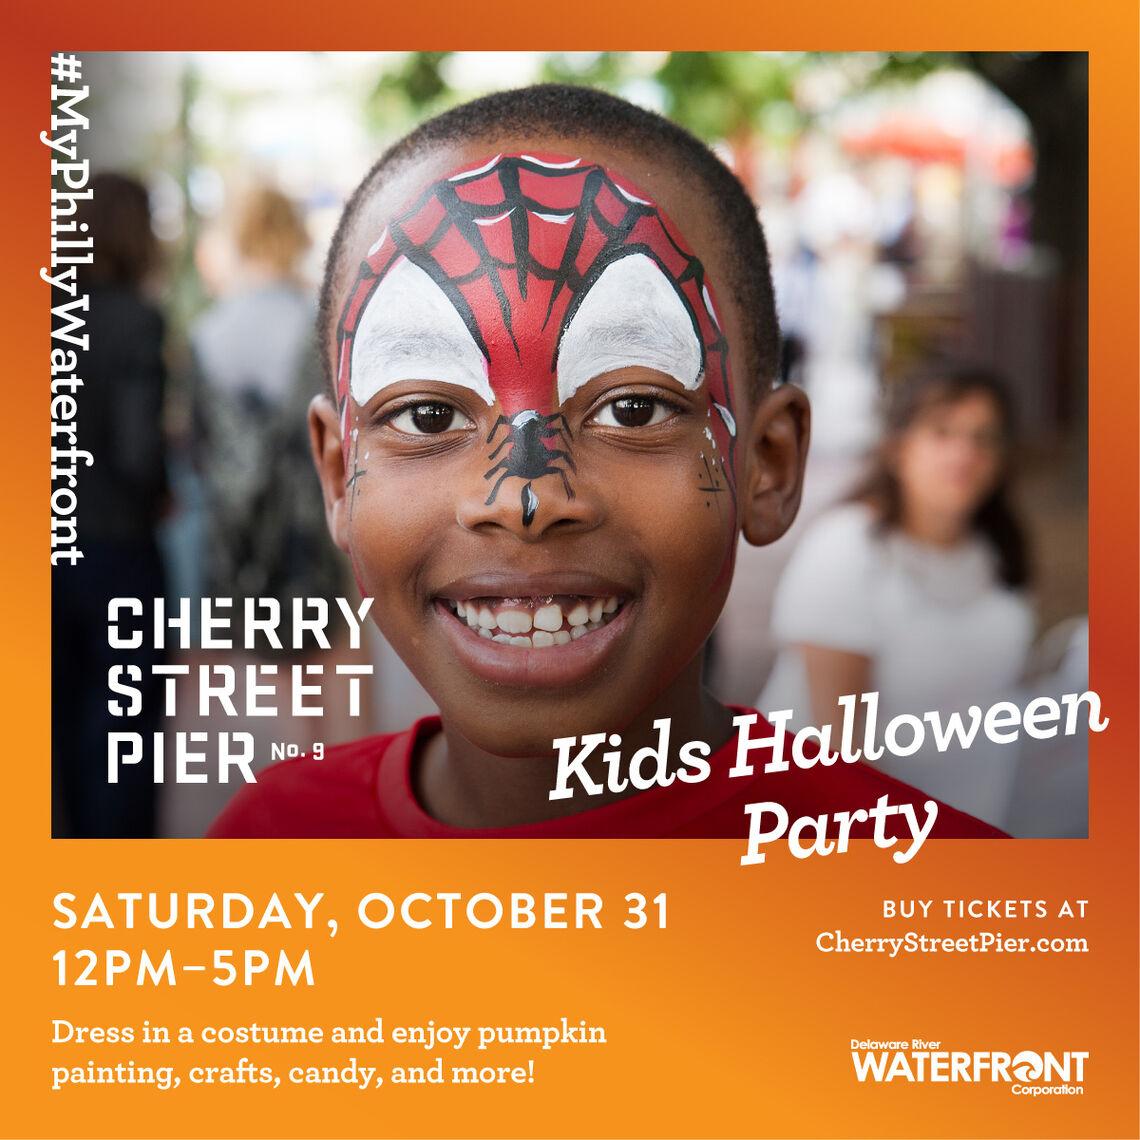 kids halloween party 2020 10 31 social